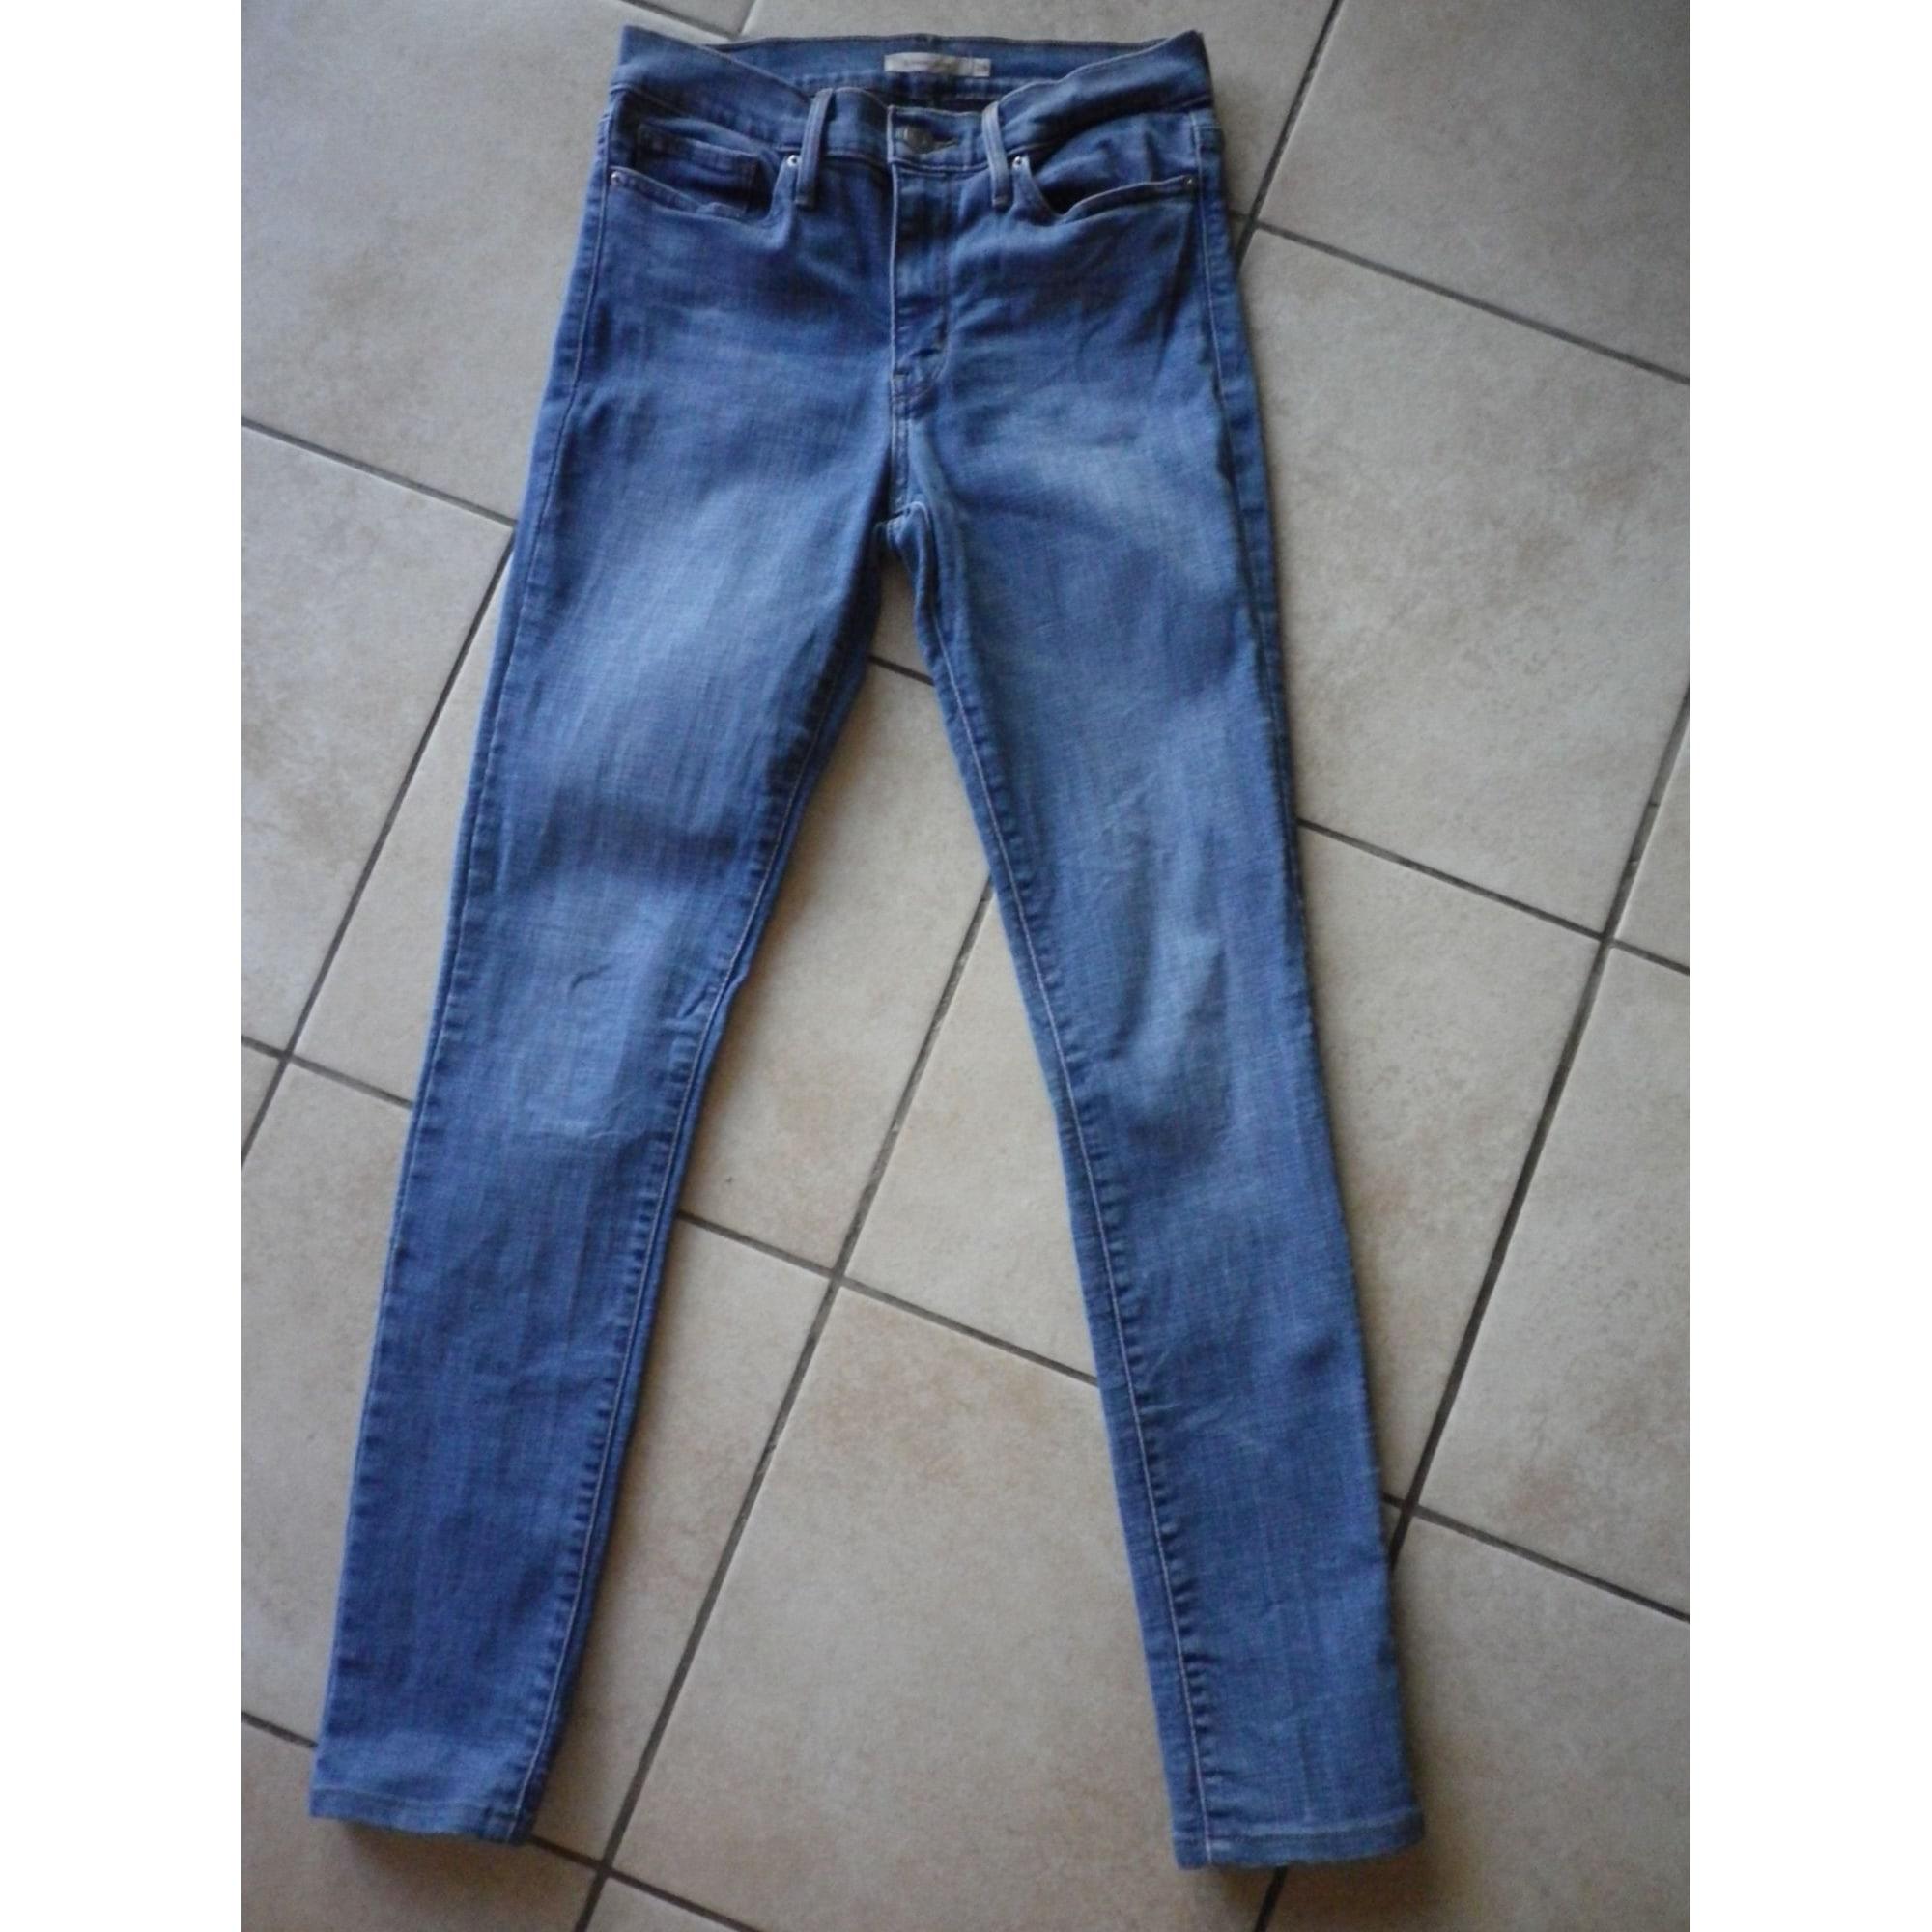 Jeans droit LEVI'S Bleu, bleu marine, bleu turquoise